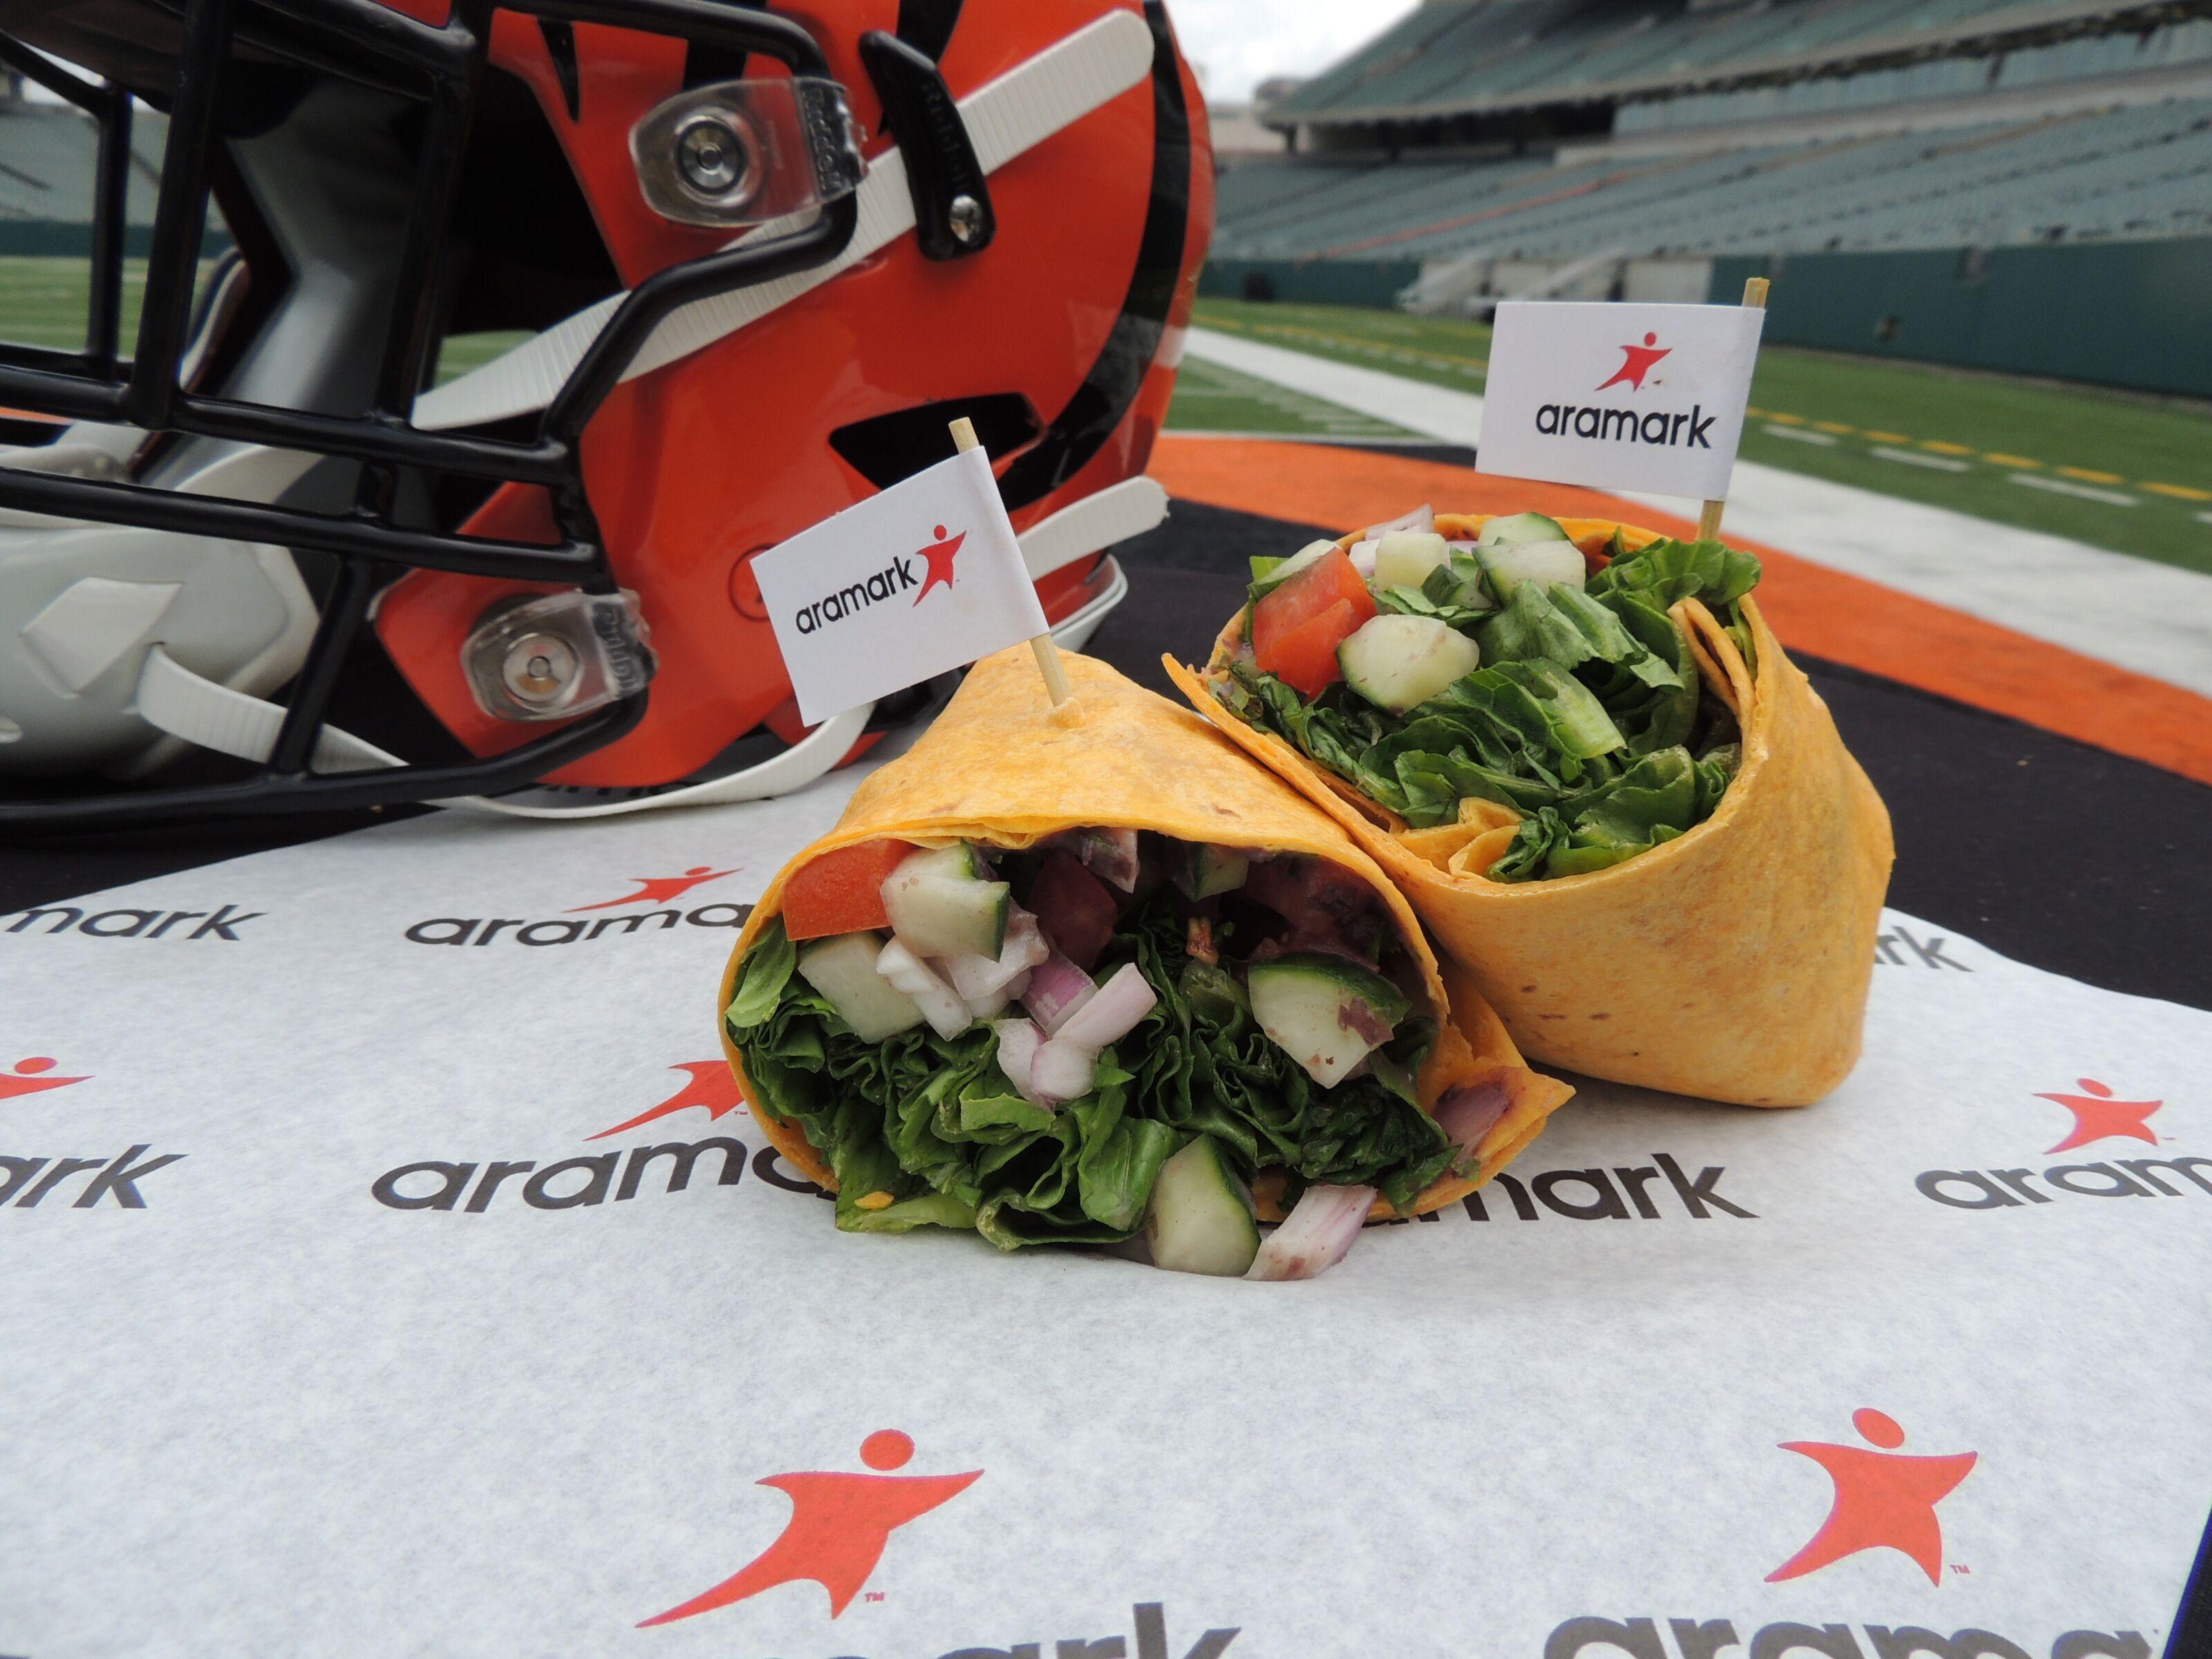 Football stadiums feature more vegetarian friendly menus